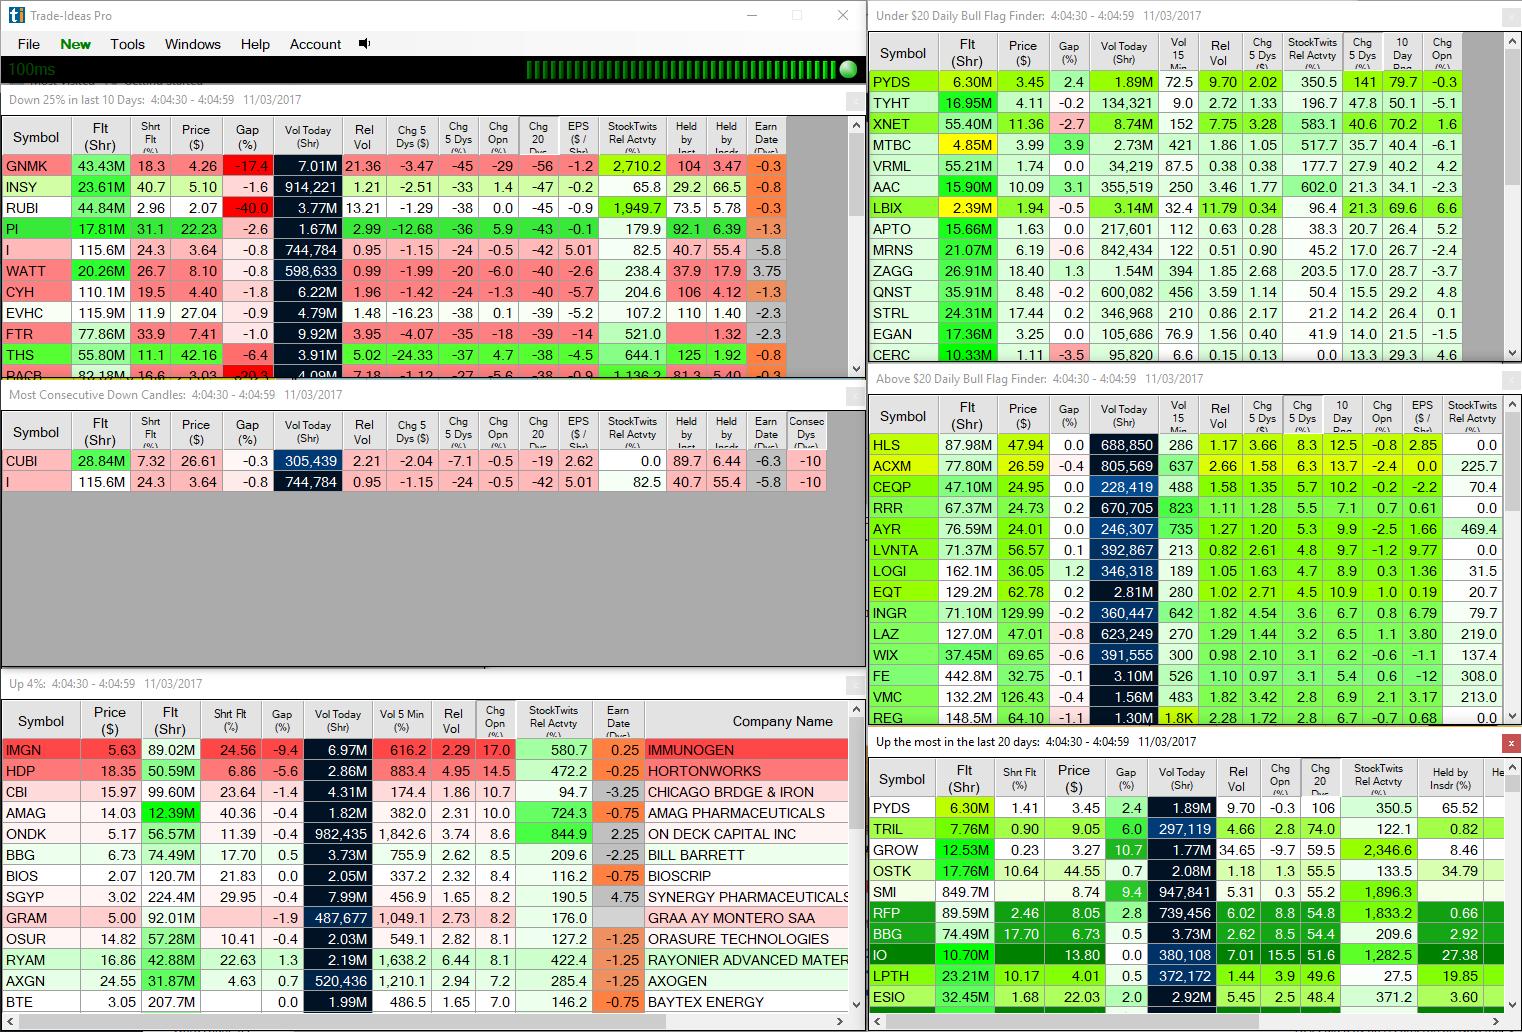 Trade Ideas Stock Scanner